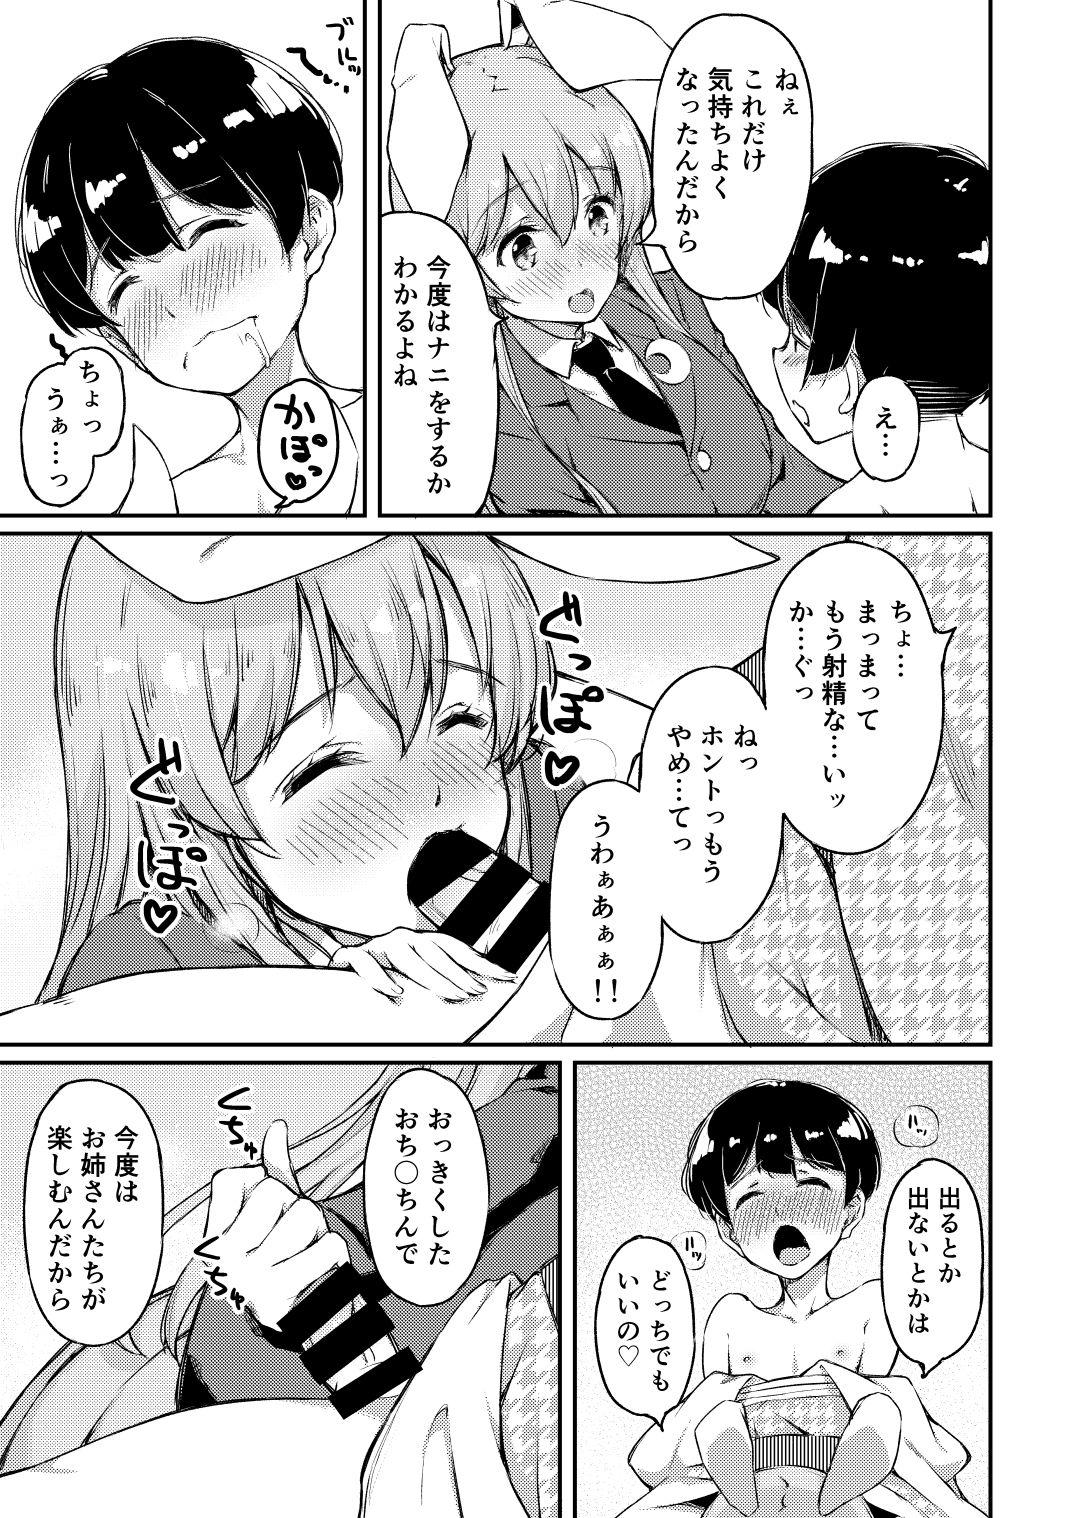 UdoTewi no, Gochisousama! 11